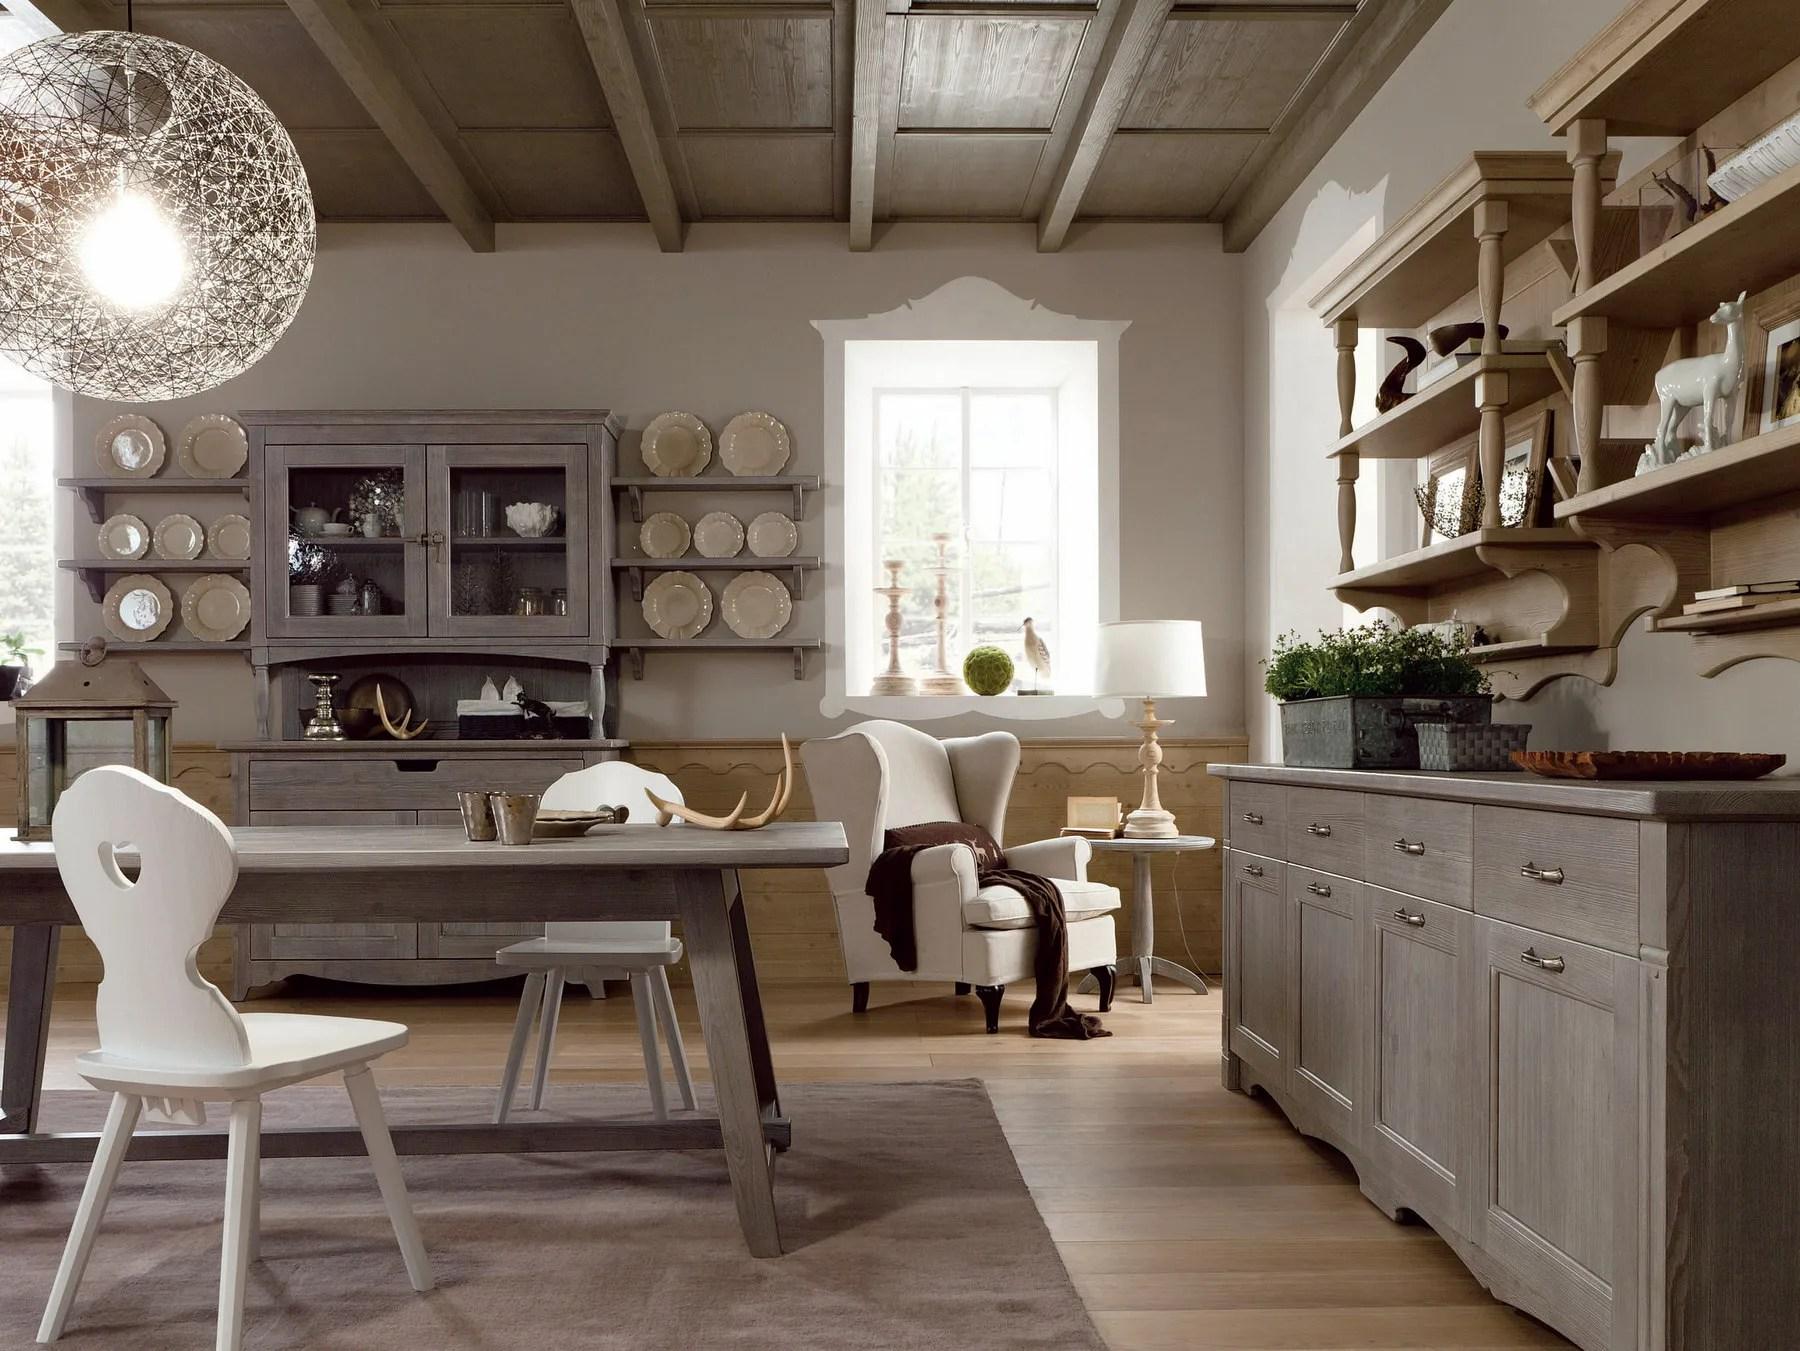 Cucina in stile rustico TABI T04 by Scandola Mobili